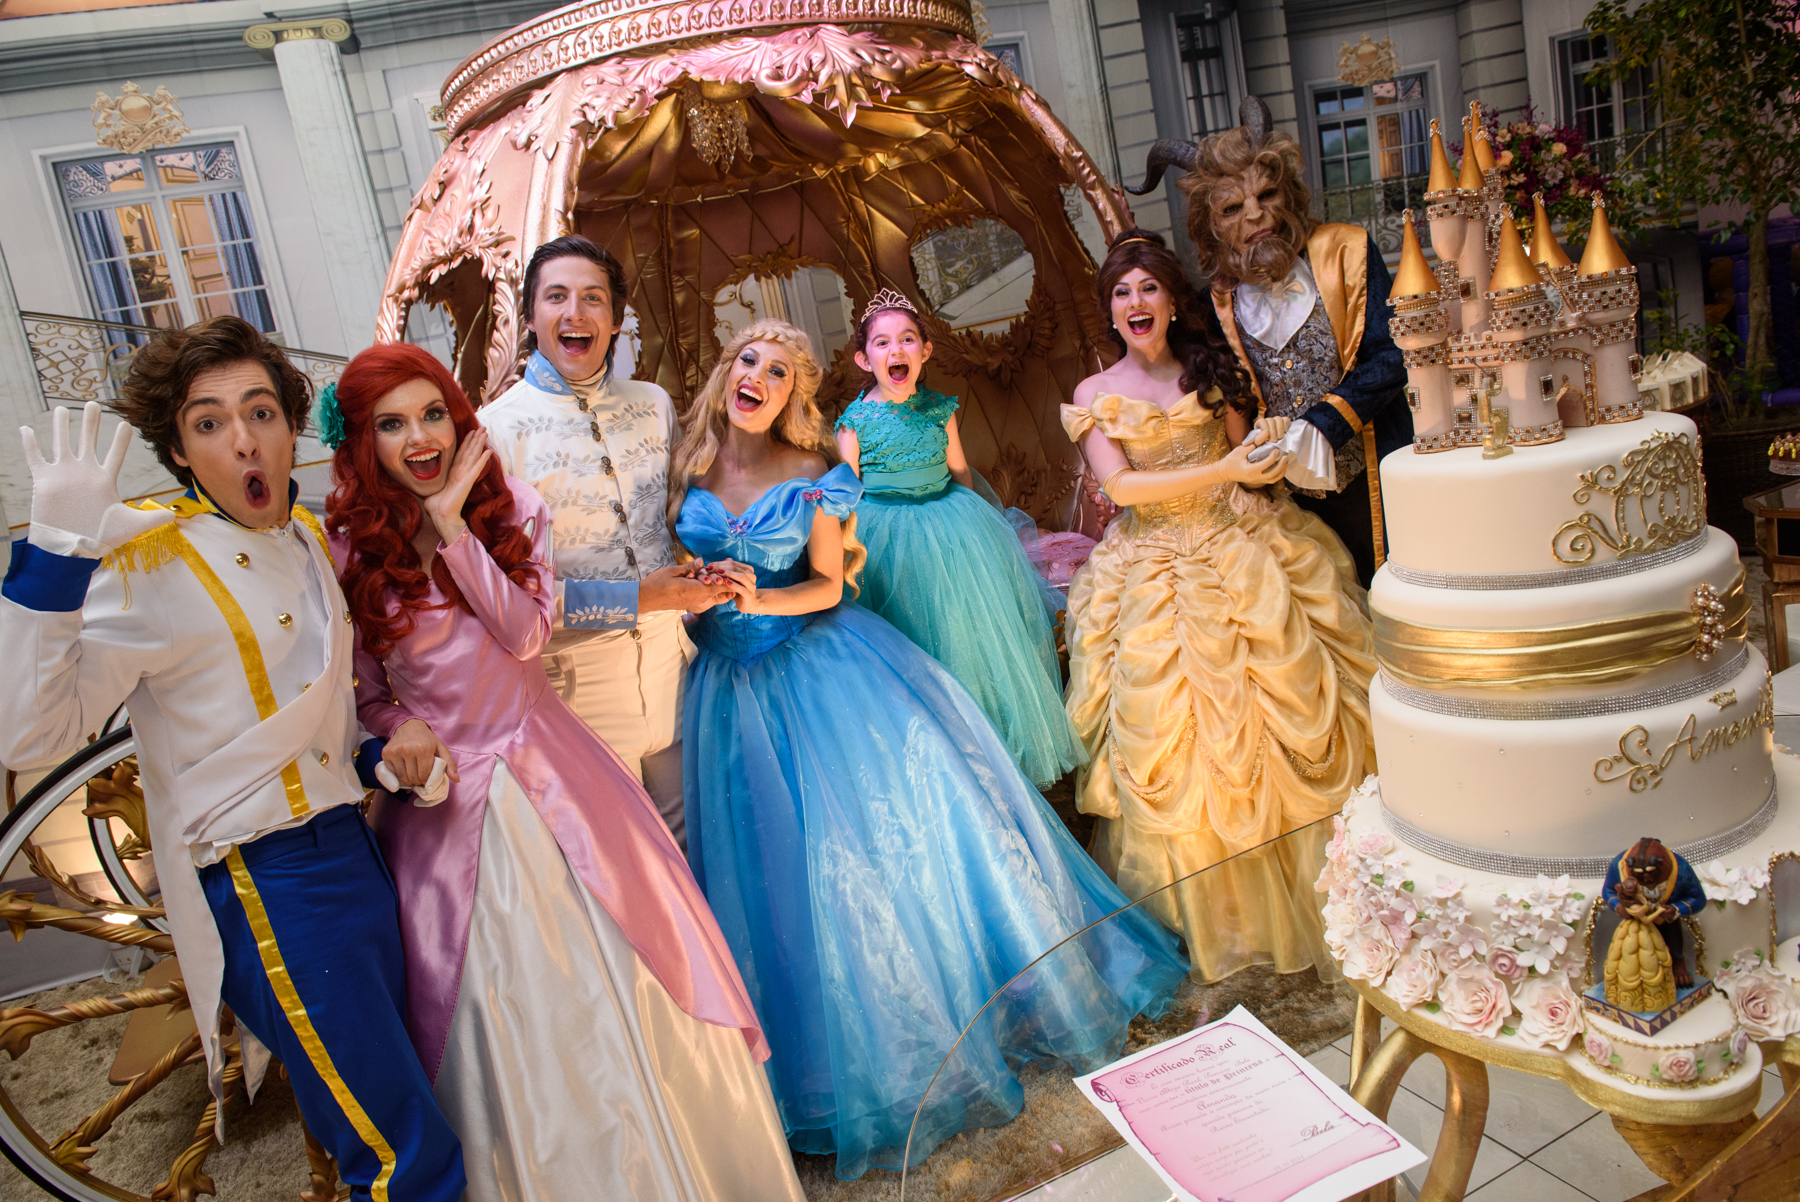 015_festa-infantil-curitiba-baile-princesas-happyfest-playhouse-encantada-guswanderley.jpg